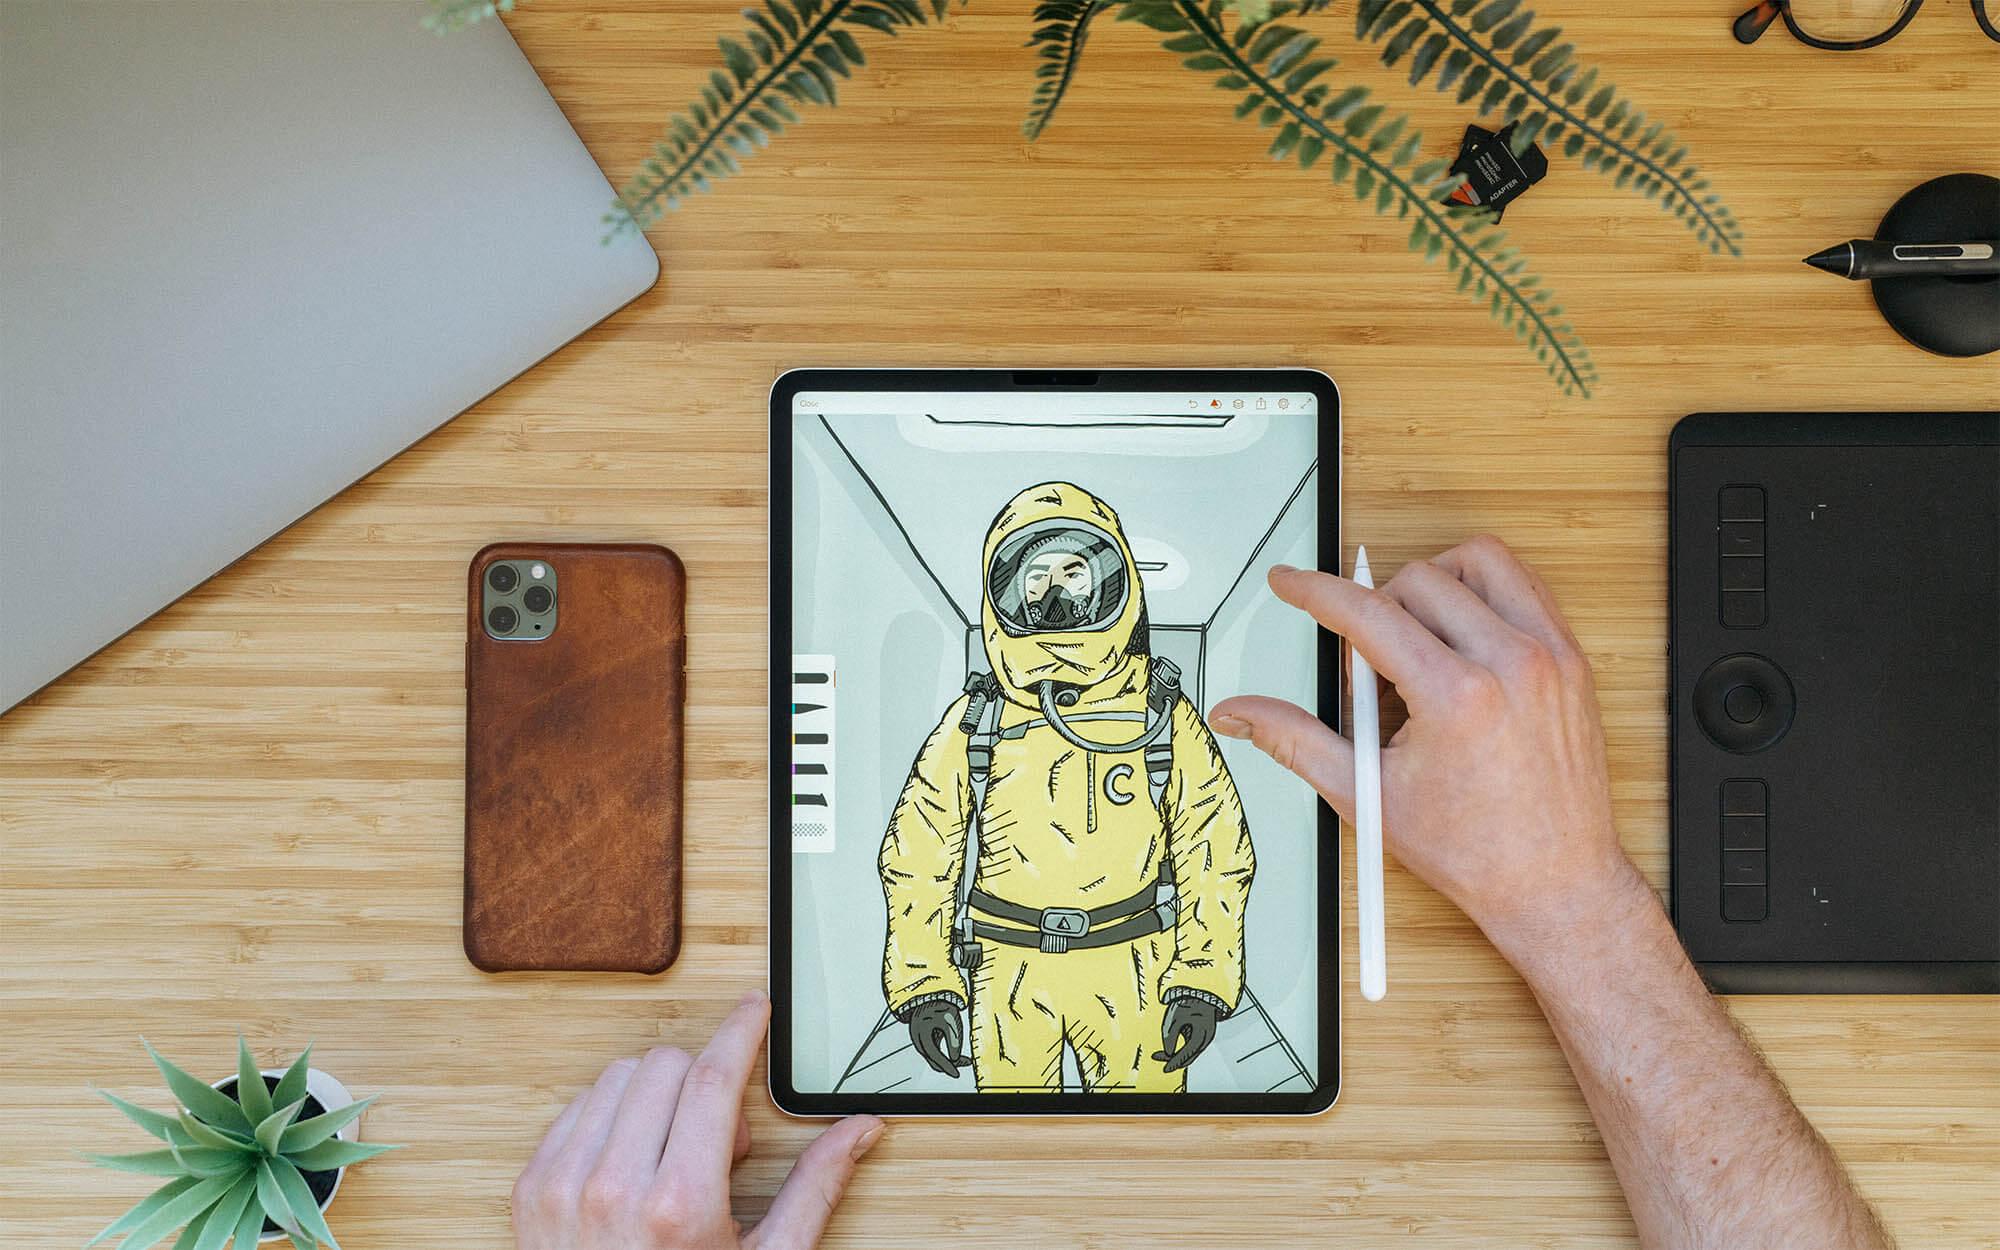 Person looking at illustration on ipad